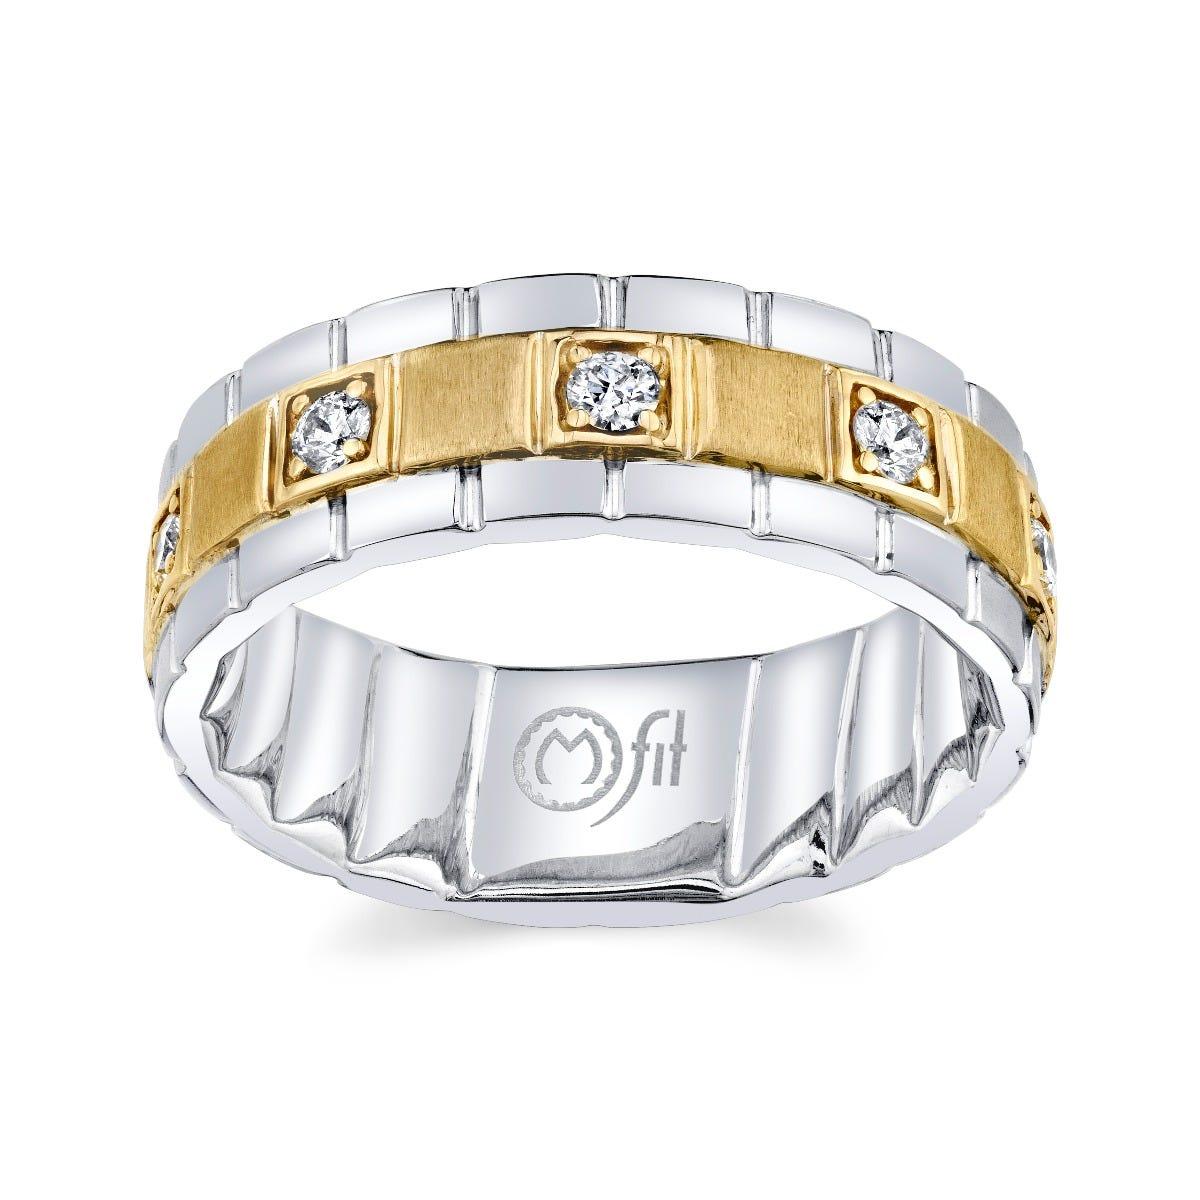 Men's MFIT Diamond Band 1/3ctw in 10k White & Yellow Gold